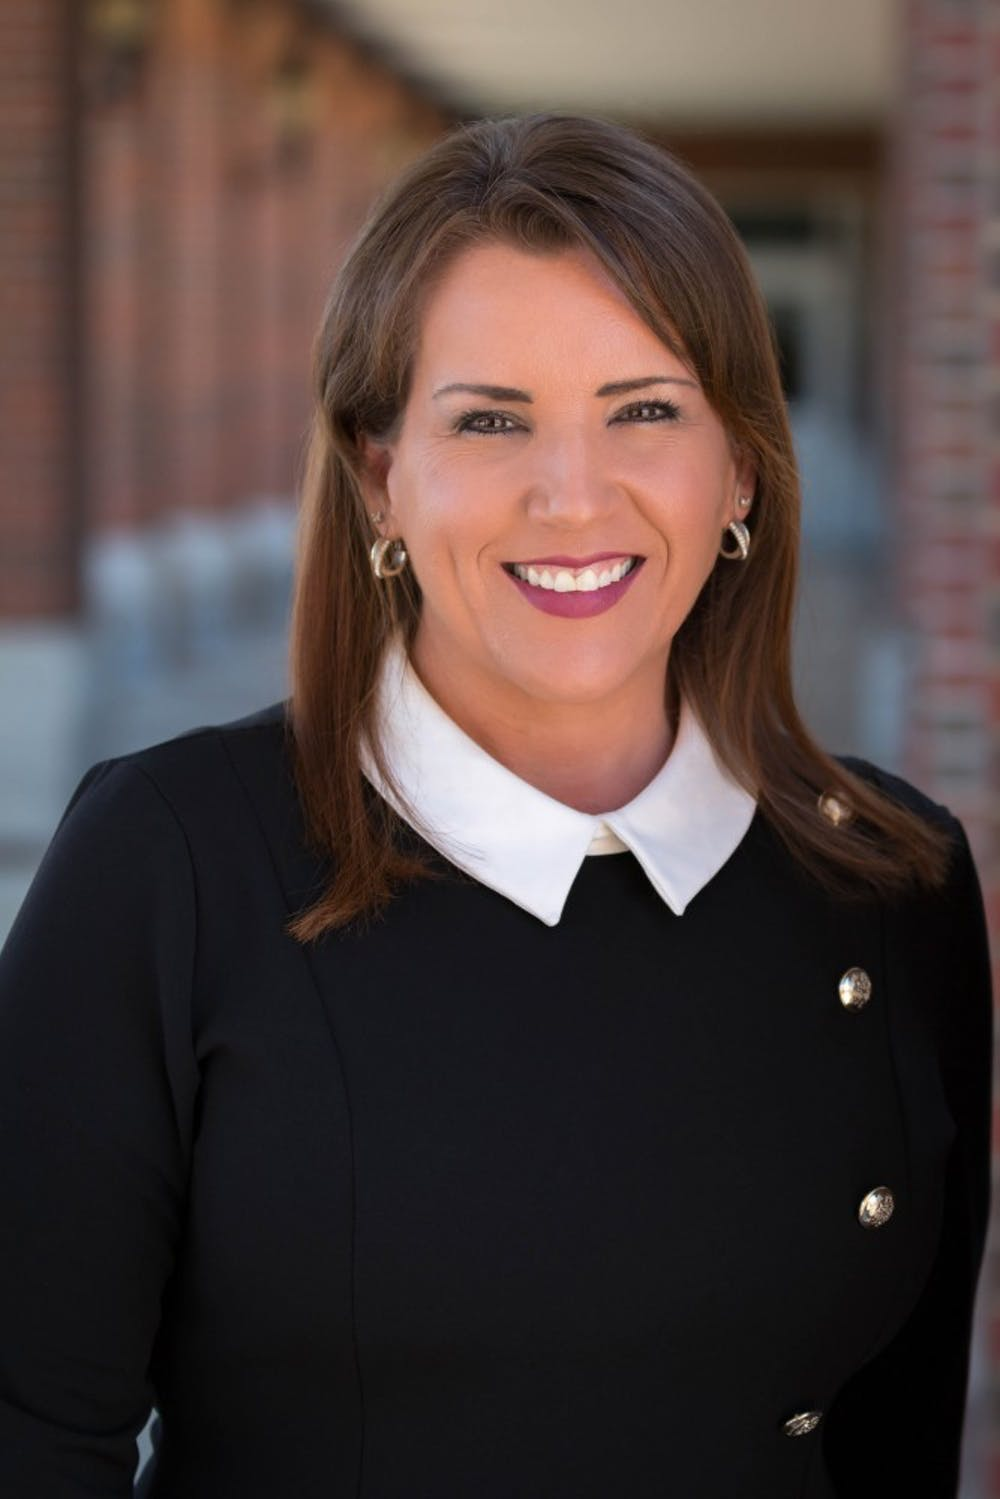 New interim executive dean for regional higher education announced